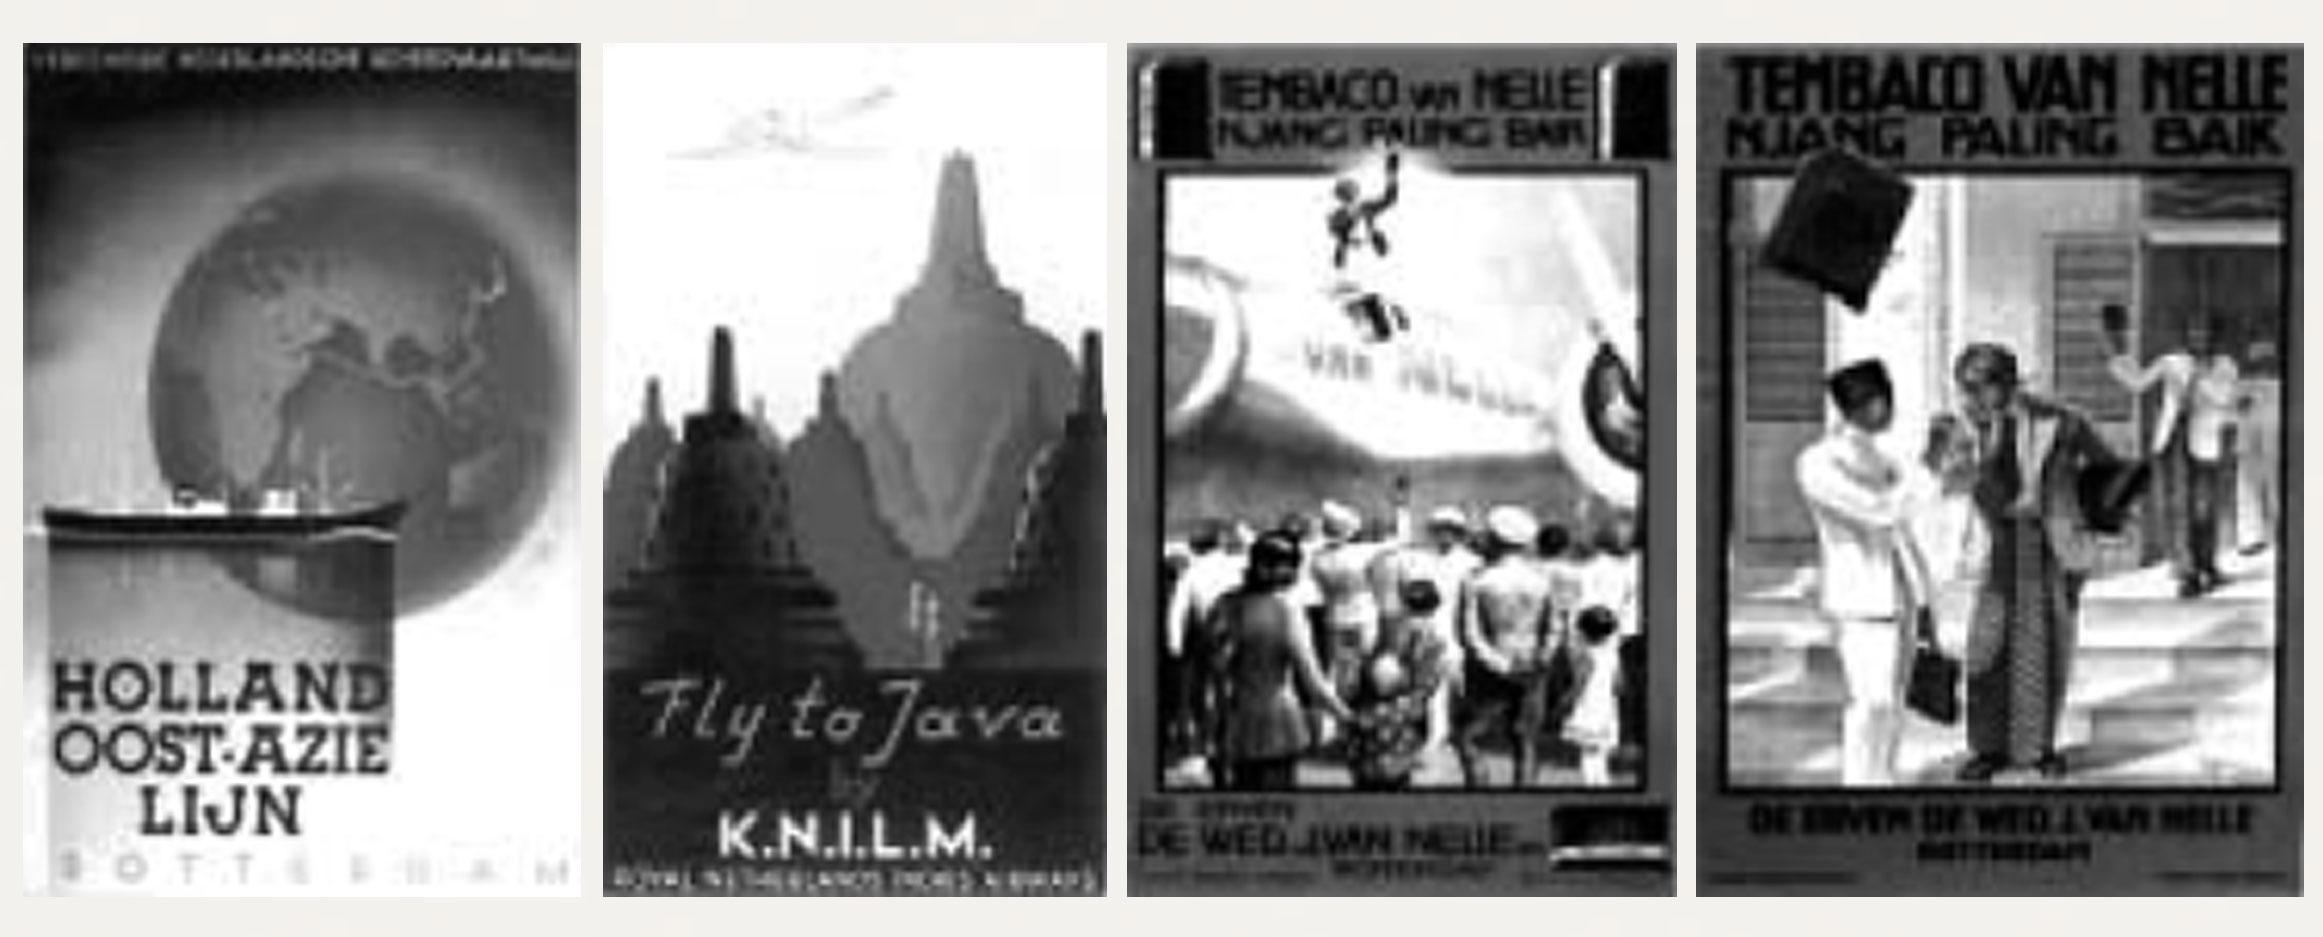 "Gambar 2. (a & b) Iklan wisata ""Holland Oost-Azie Lijn"" karya J.Lavies tahun 1937 dan iklan wisata ""Fly to Java by KNILM"" karya J. Lavies tahun 1937; (c & d) Iklan ""Tembaco van Nelle"" karya M. van Meerteren Brouwer tahun 1932."